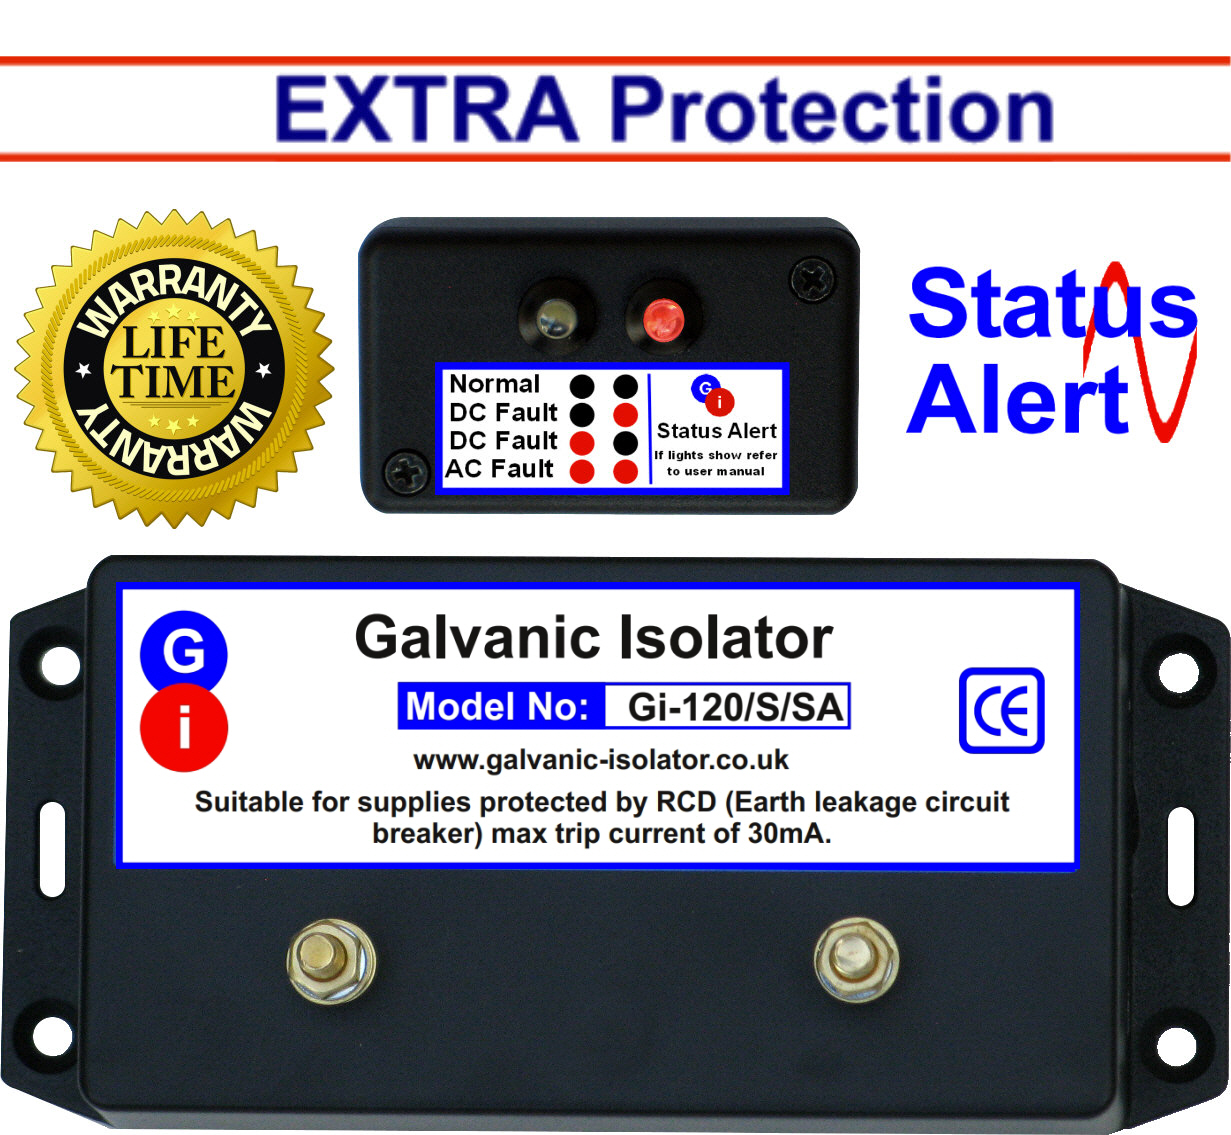 Galvanic Isolator - Wire In - Extra Protection - Status Alert on